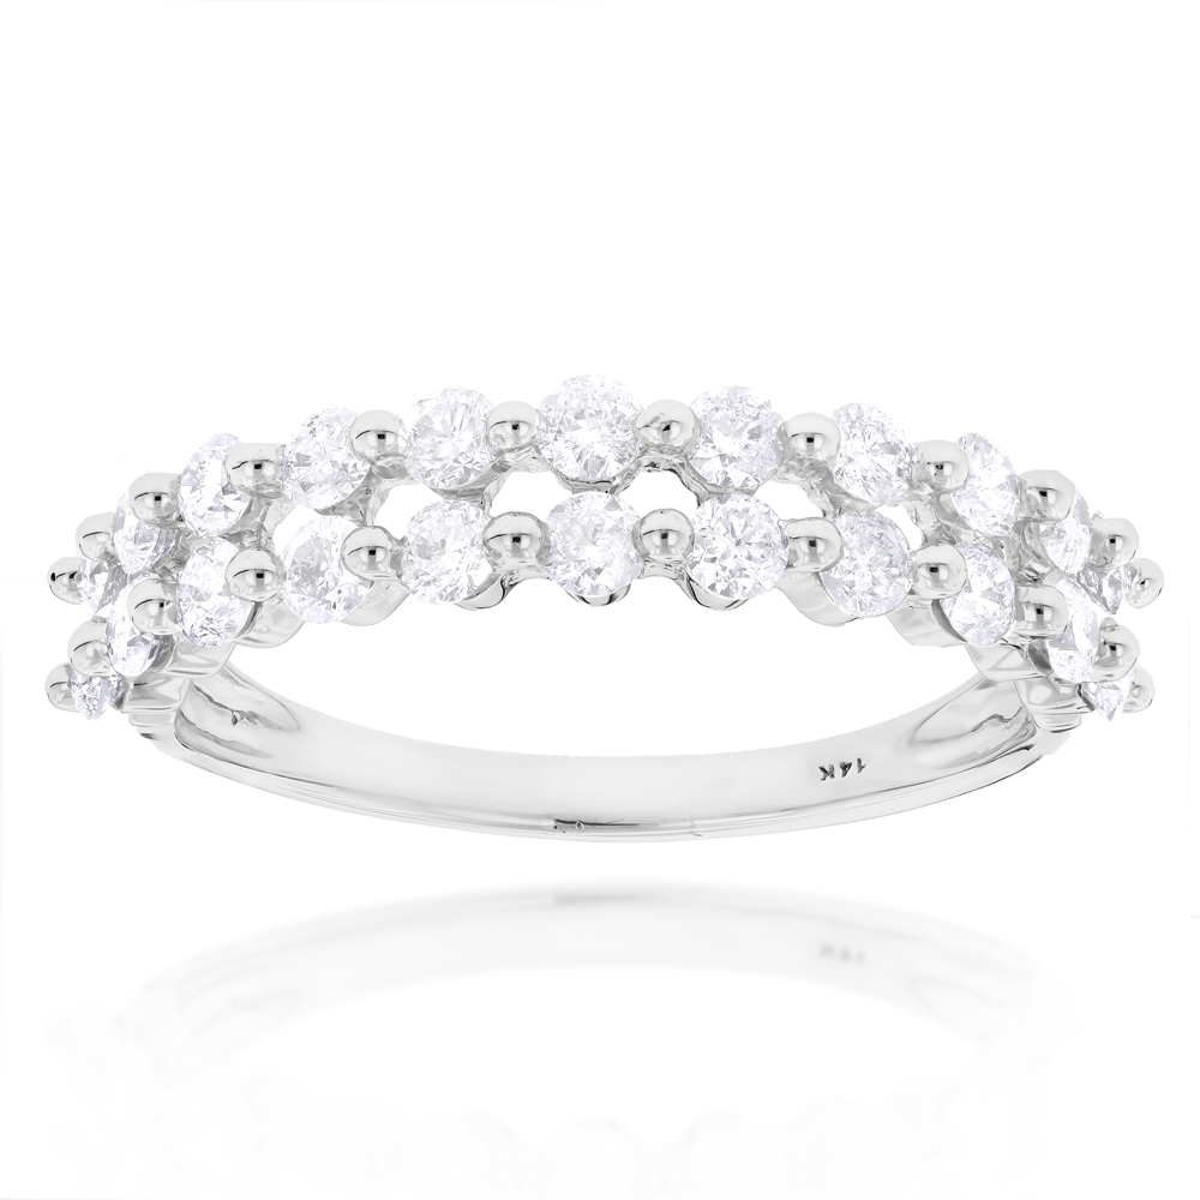 Thin Ladies Designer Diamond Wedding Band 1ct 14K Gold